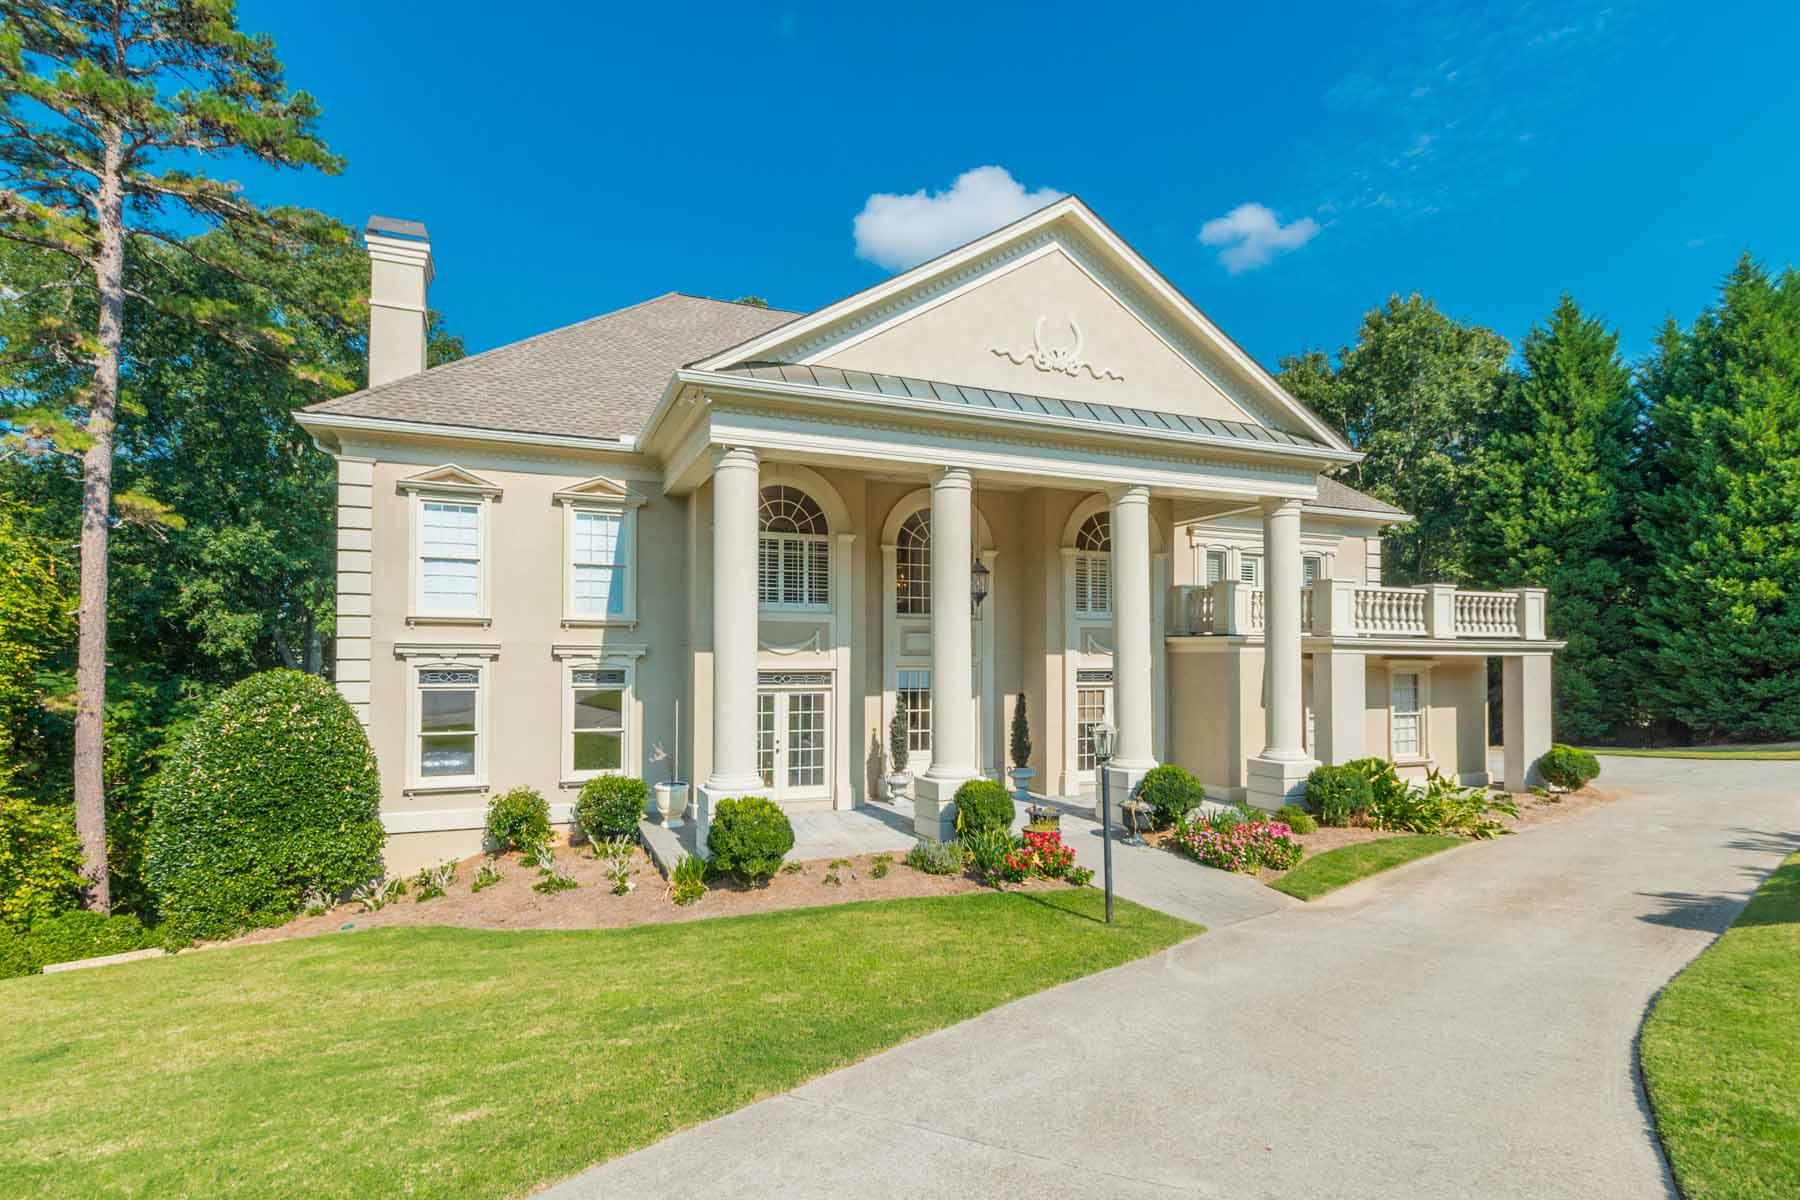 Casa Unifamiliar por un Venta en Roswell Estate 115 S Smead Court Roswell, Georgia, 30076 Estados Unidos